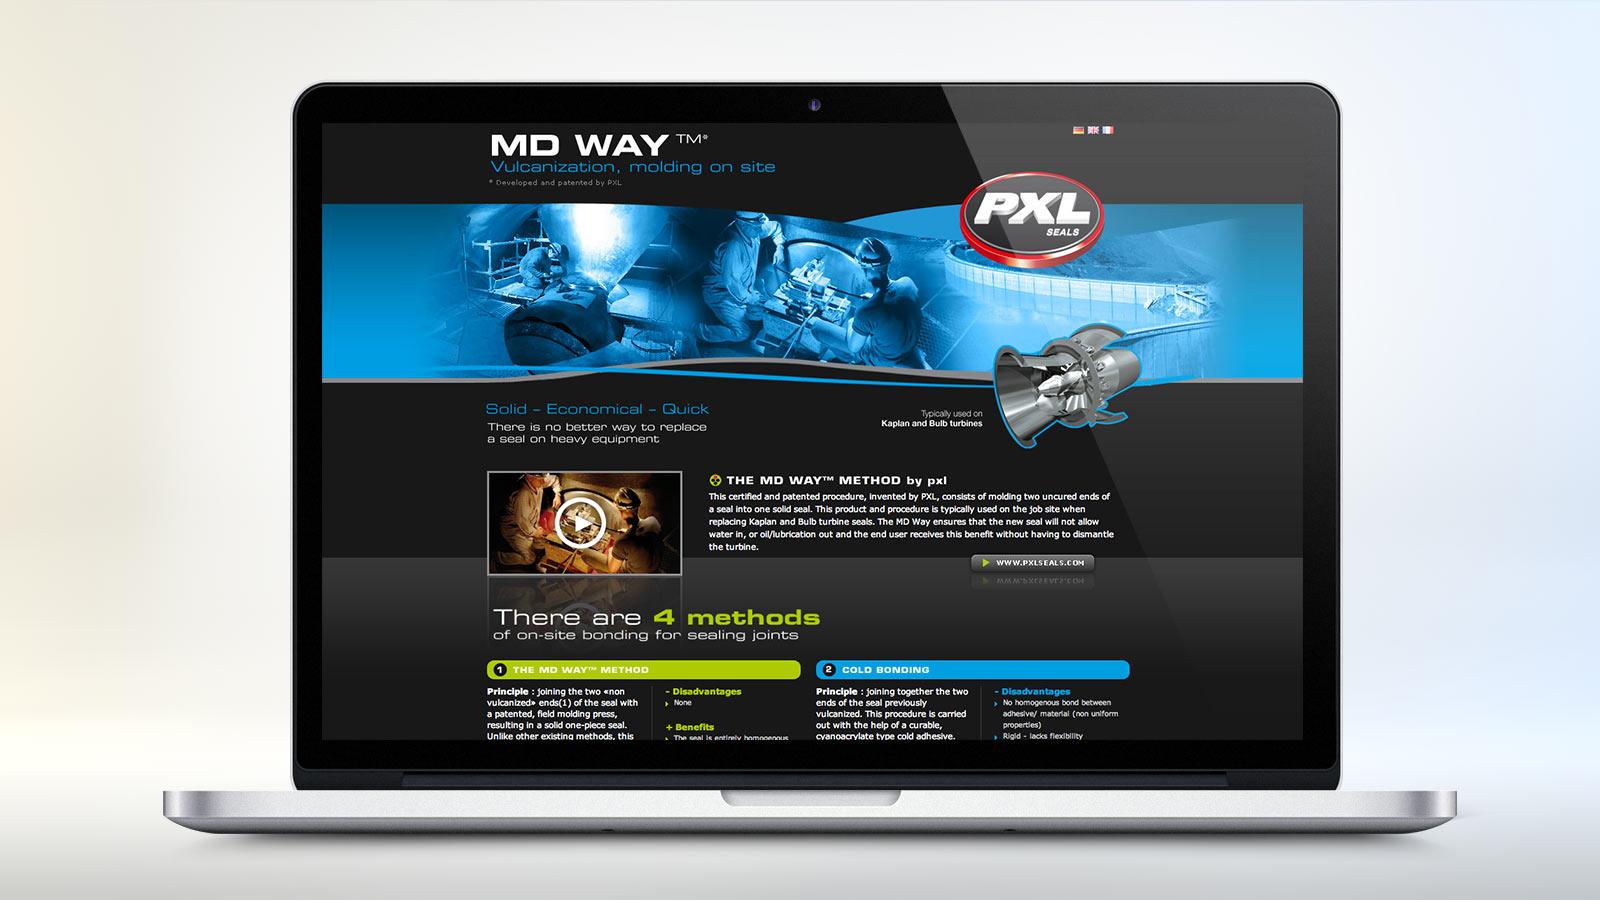 SC-PXL-mdway1.jpg